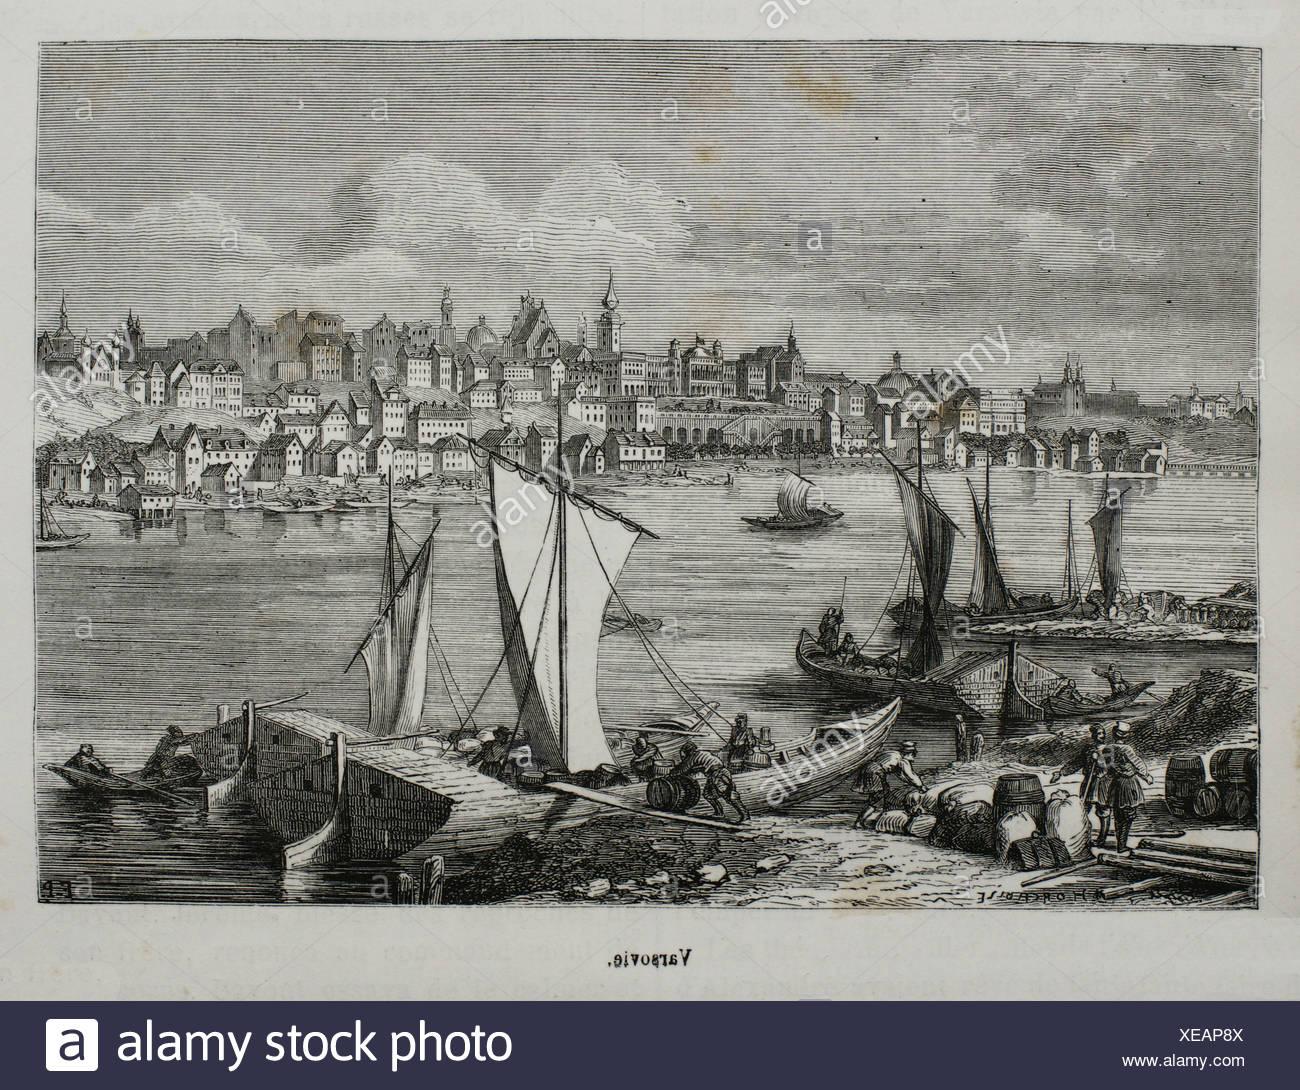 Warsaw, Poland (19th century) - Stock Image